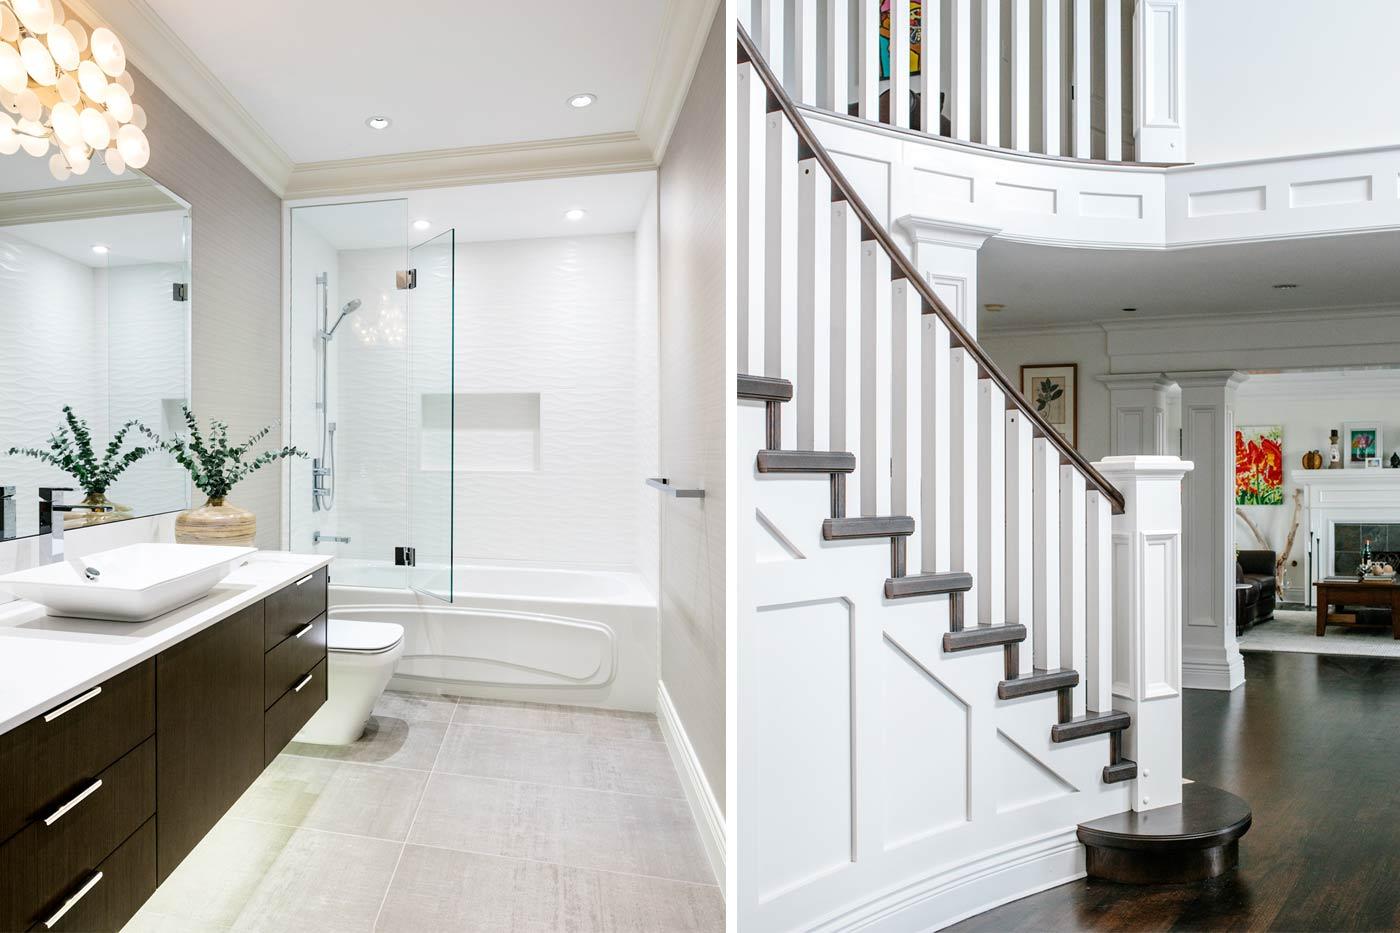 Staircase and Bathroom Renovation